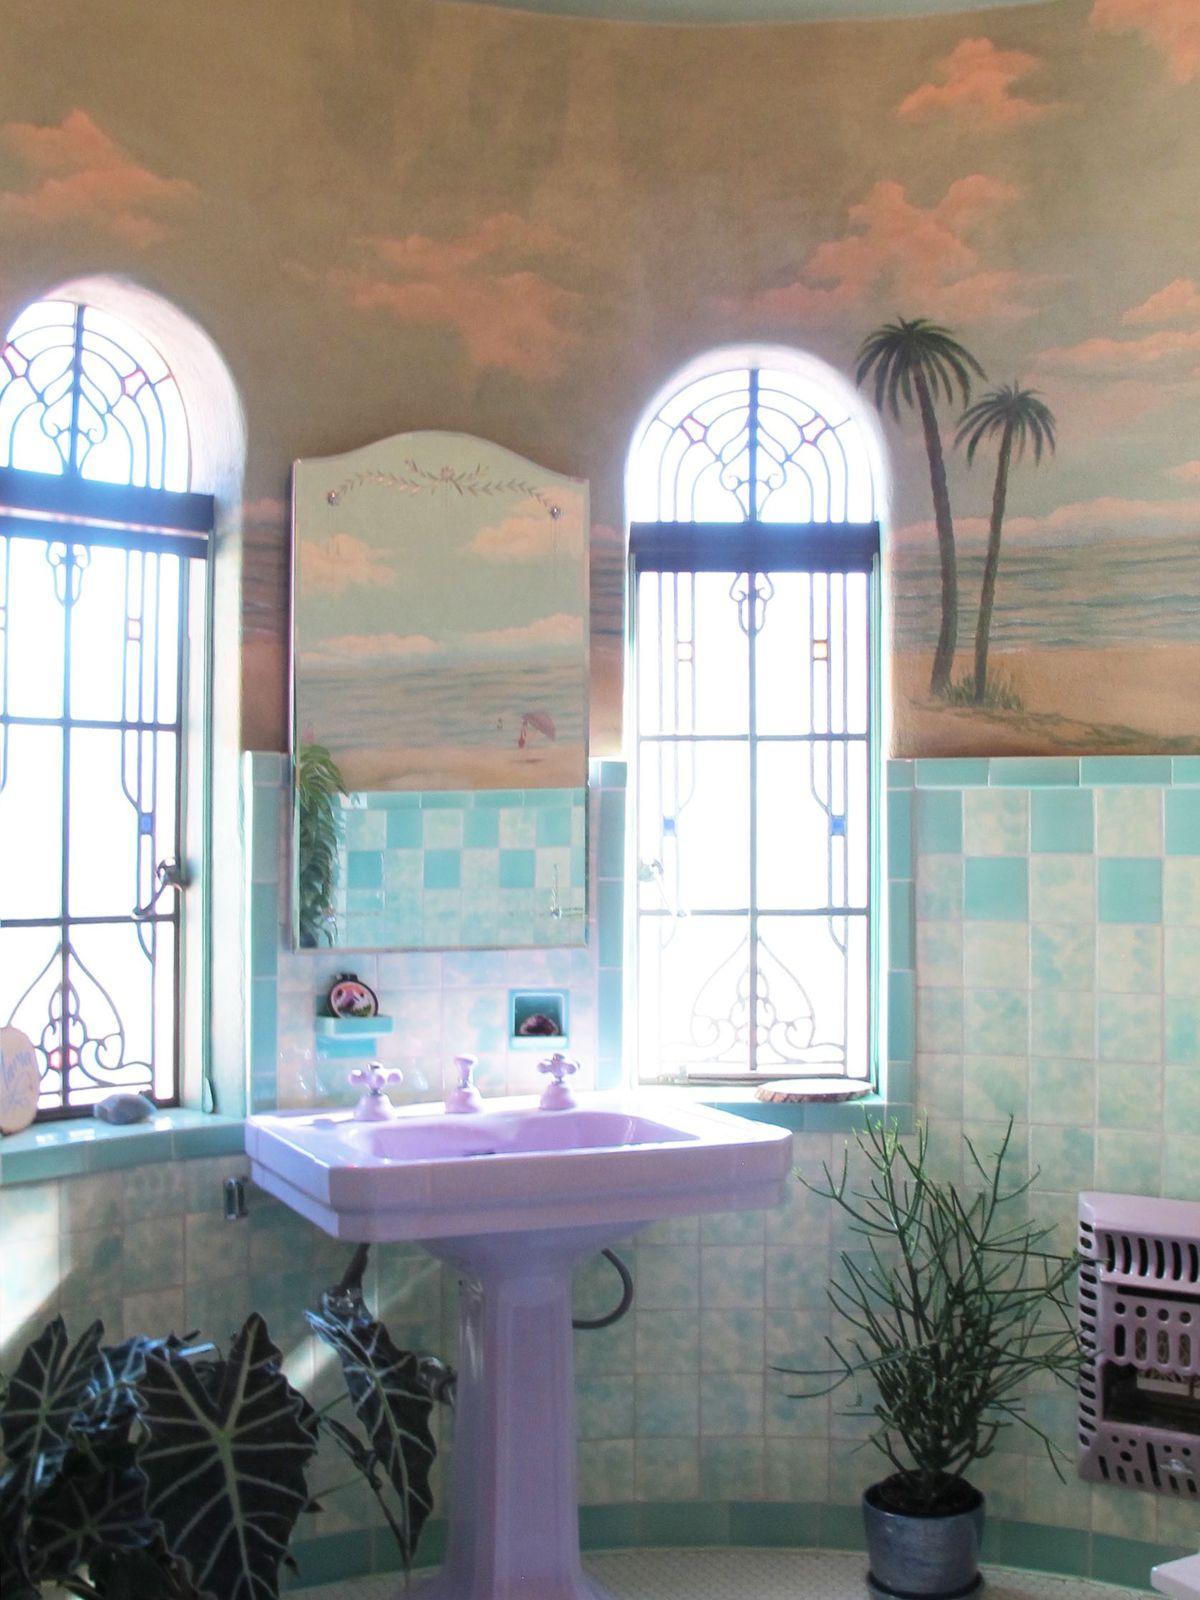 Historic Hutsell Mediterranean Home Photo Video Shoot Location 37.jpg